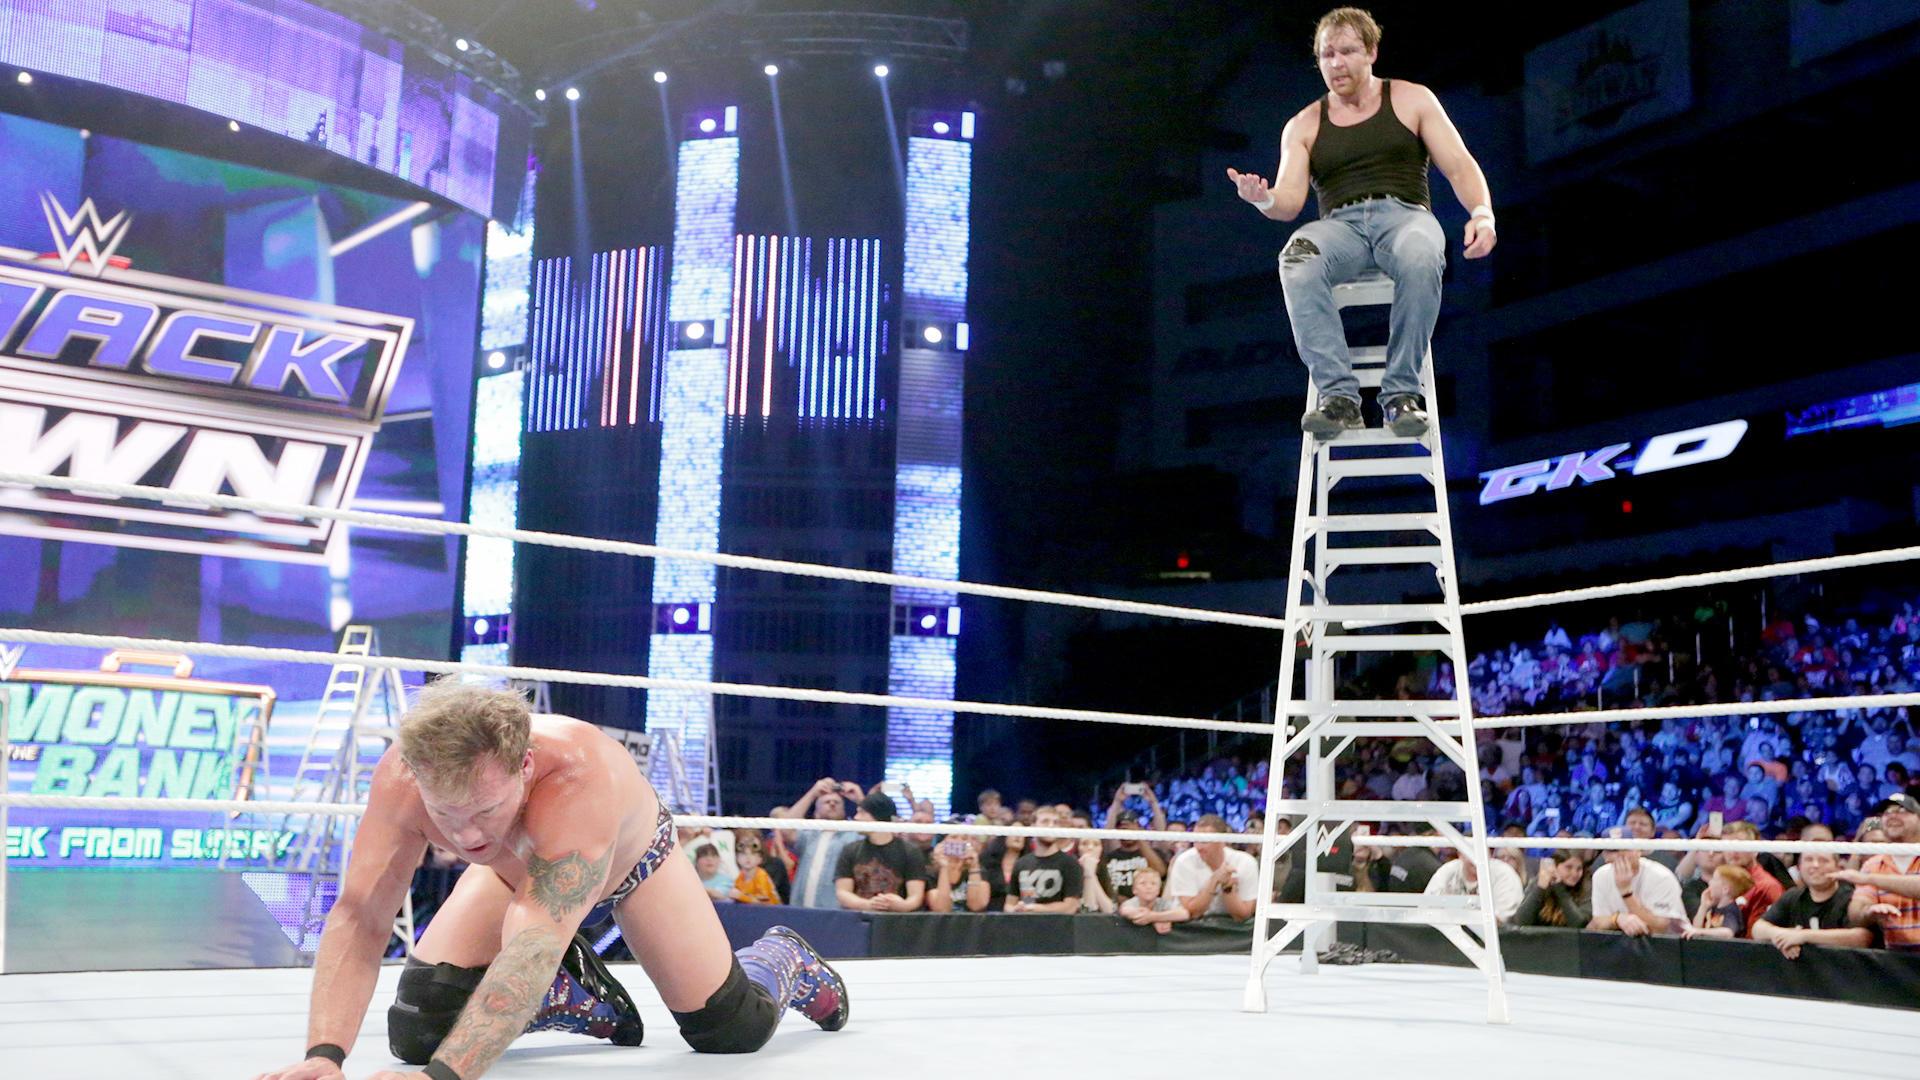 Resultats WWE SmackDown 9 juin